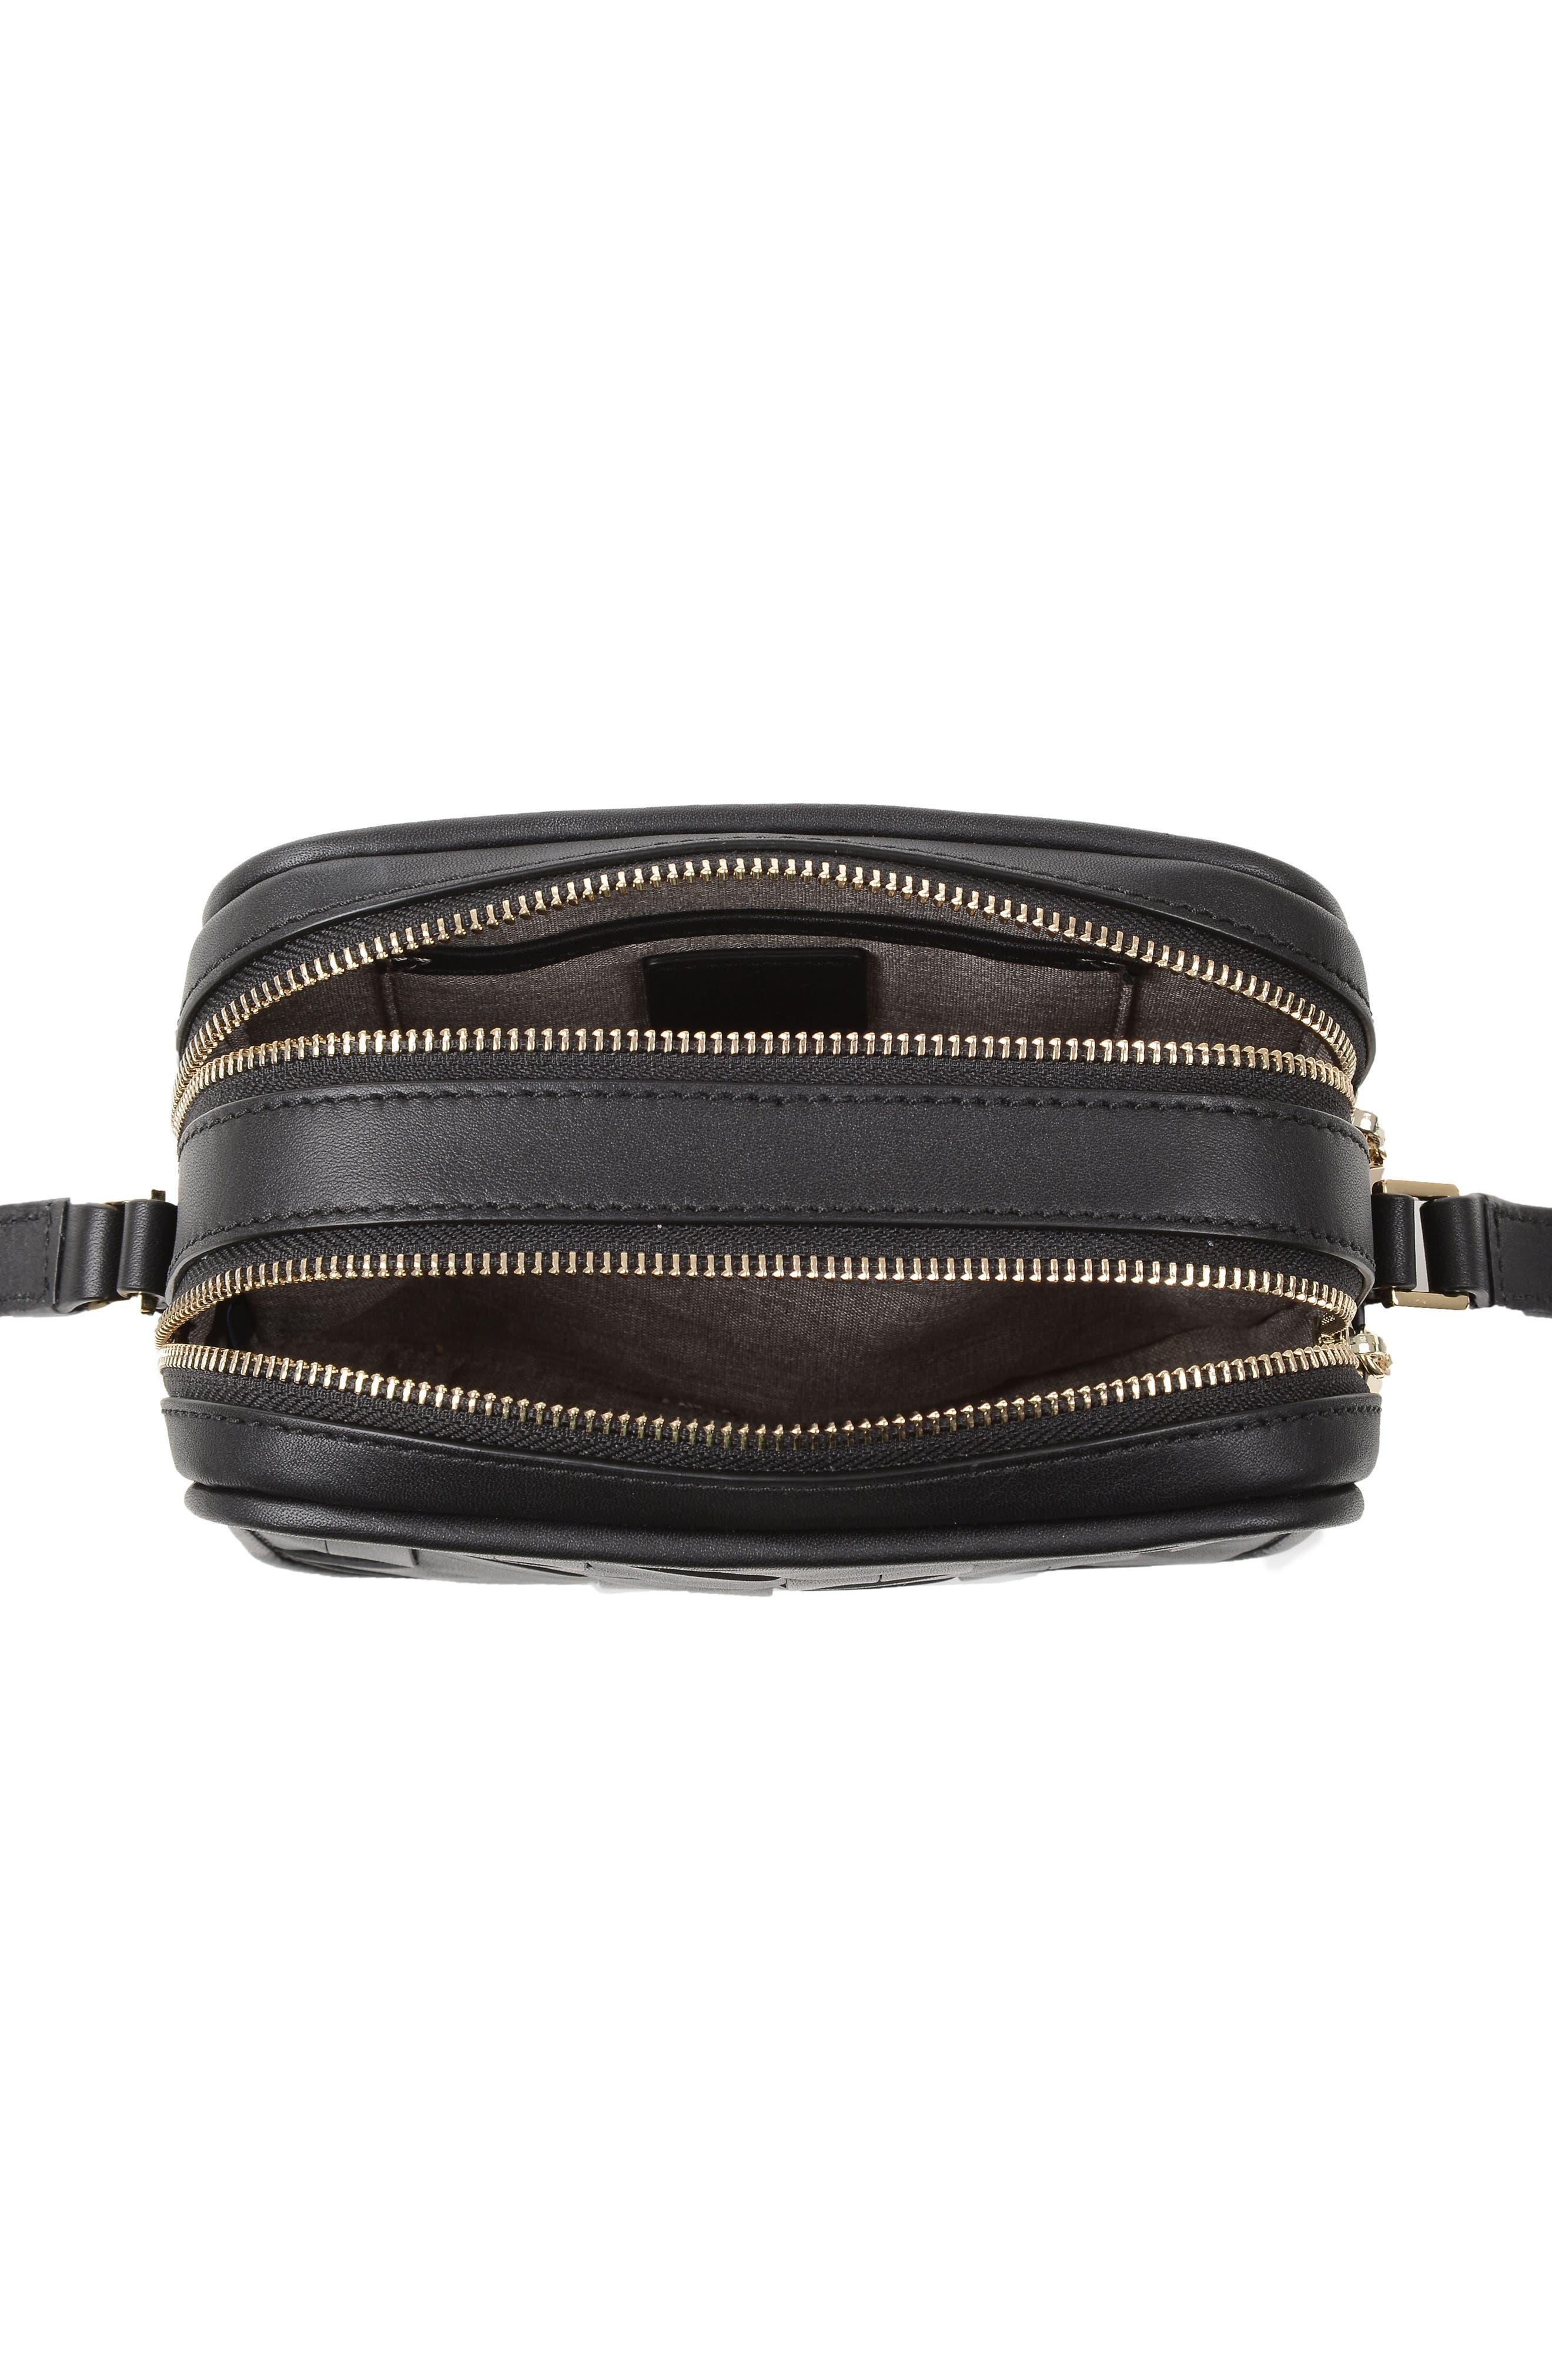 Explorer Woven Leather Camera Bag,                             Alternate thumbnail 5, color,                             Black